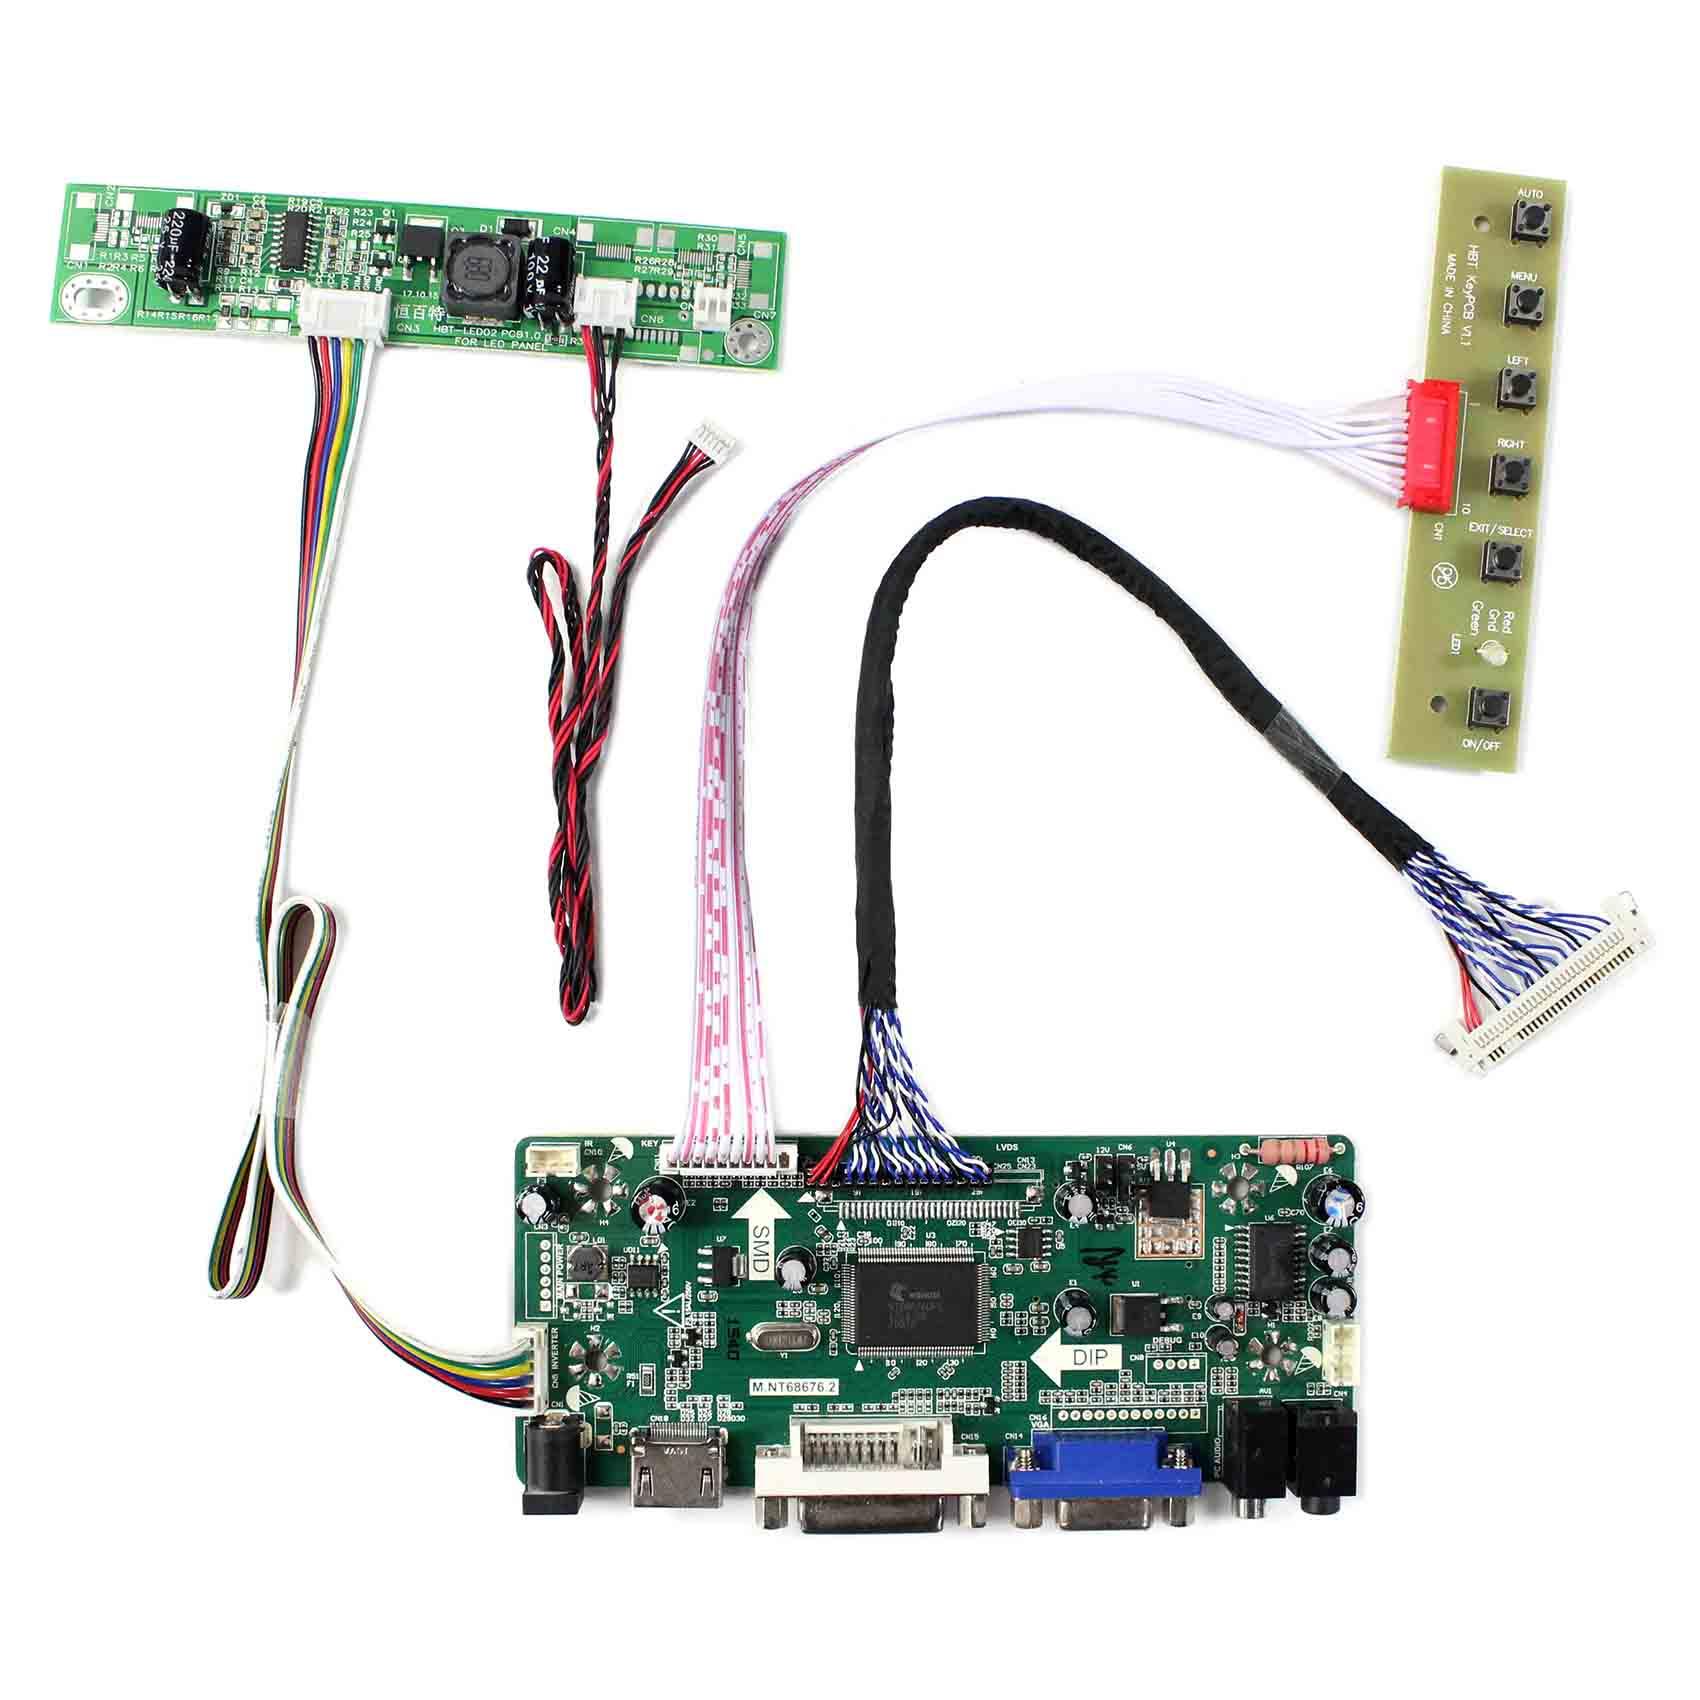 HDMI DVI VGA Audio Controller Board for M215HW01 VB 21 5inch 1920x1080 LCD Screen